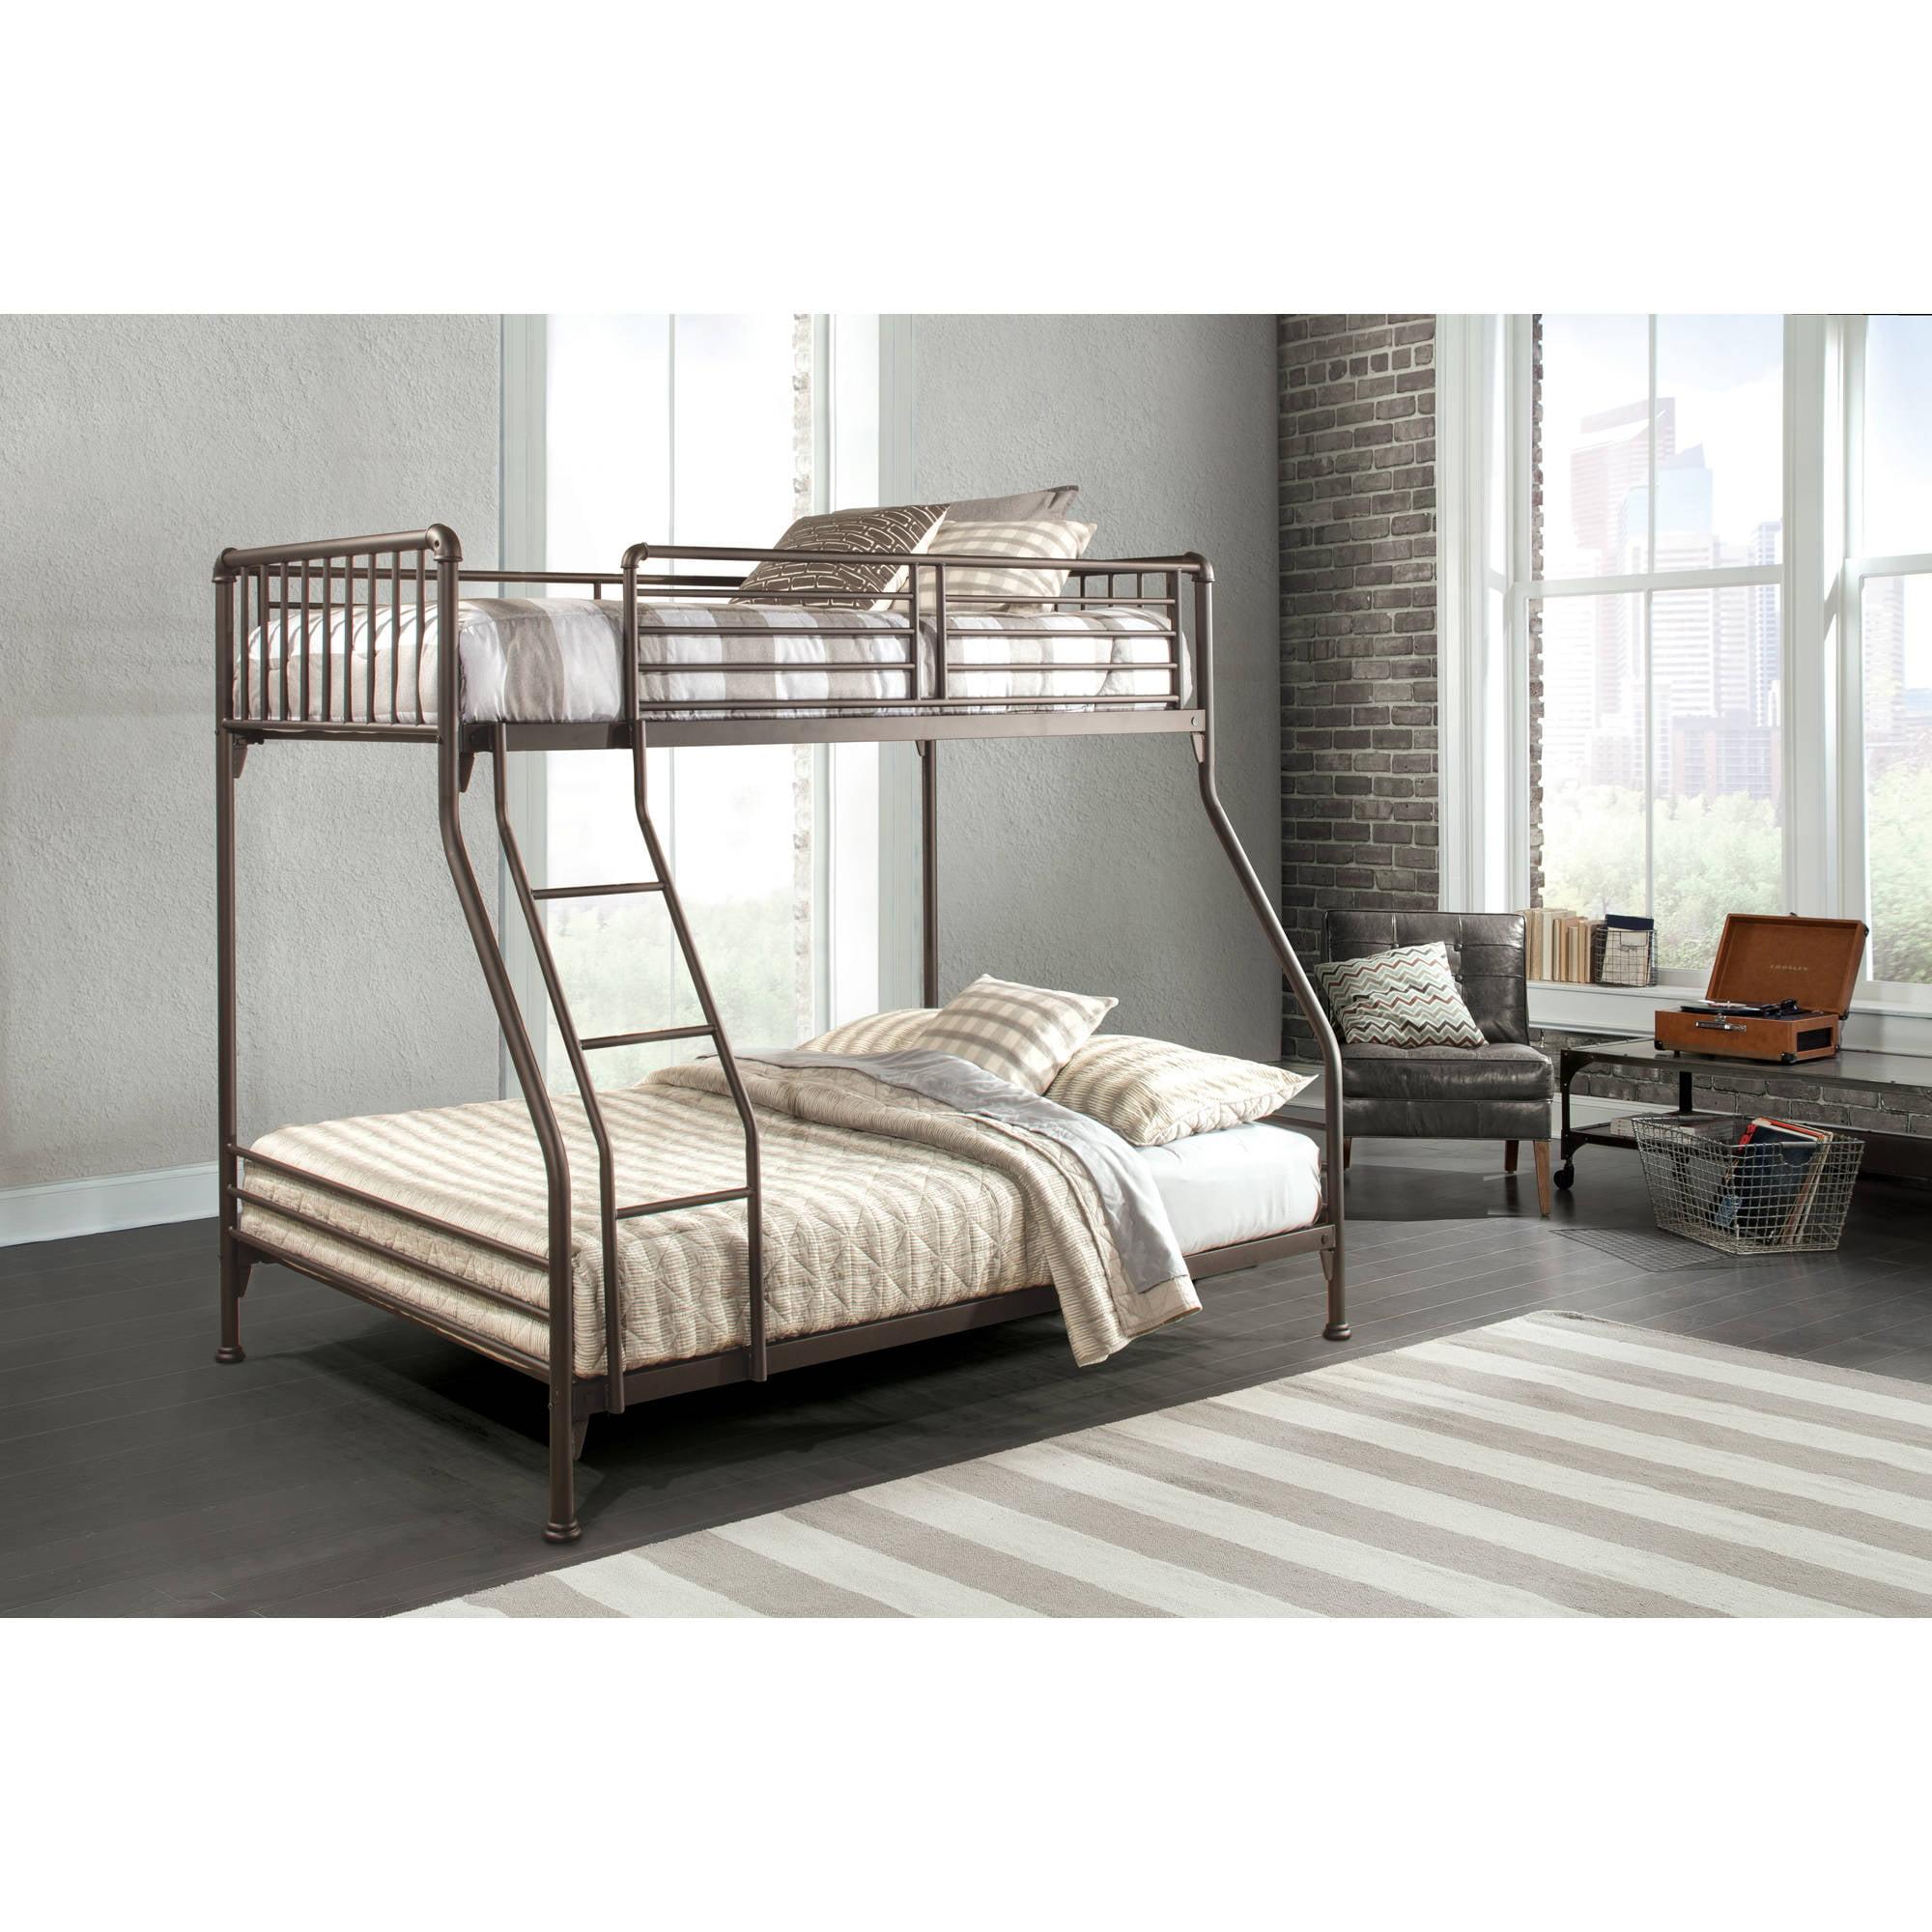 Hillsdale Furniture Brandi Twin Full Bunk Bed by Hillsdale Furniture